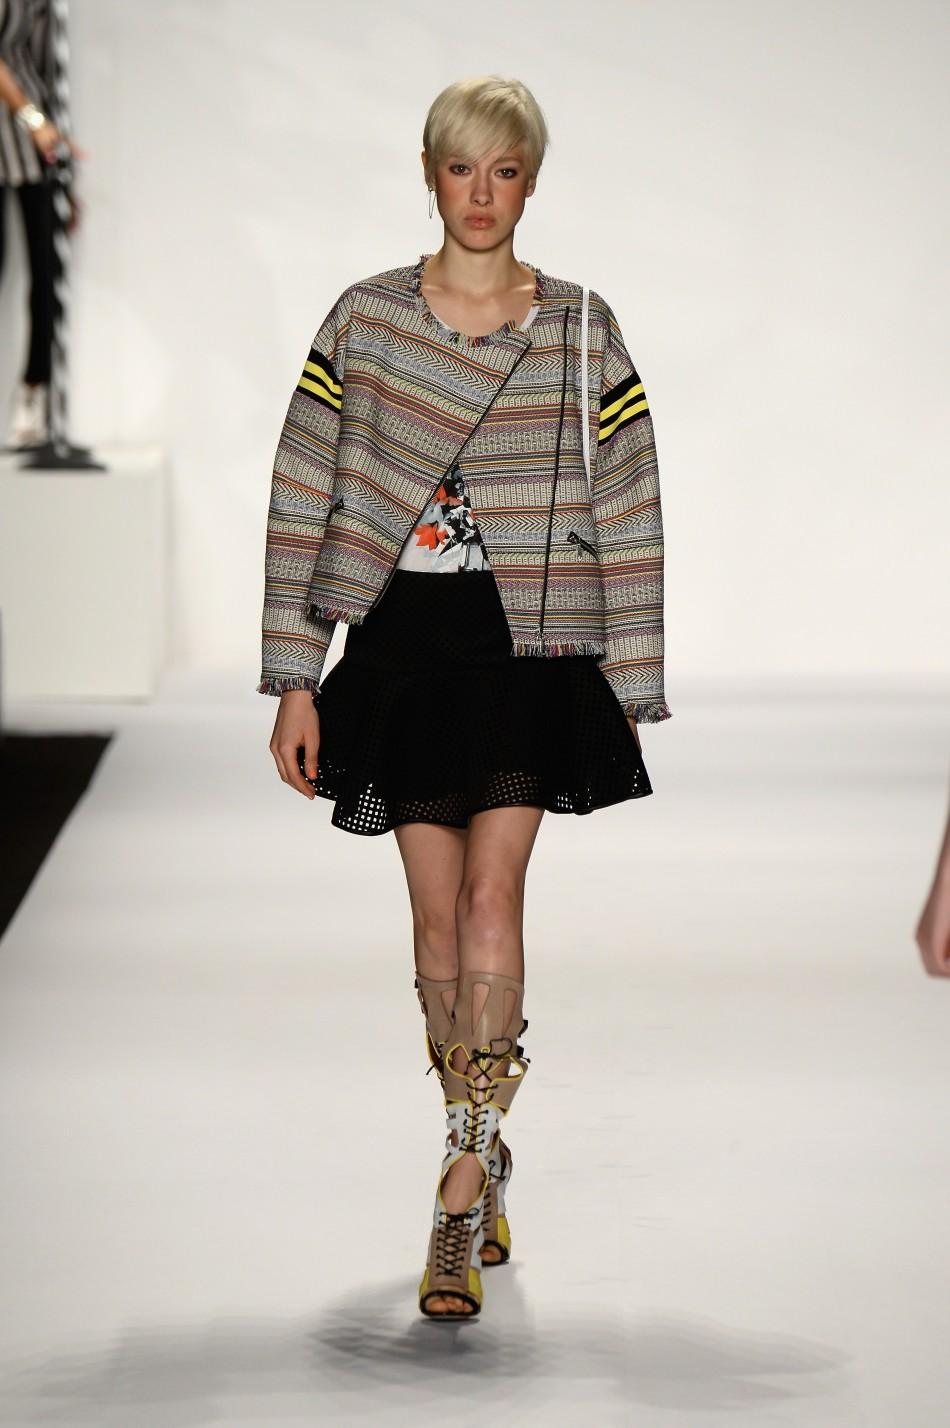 20582-rebecca-minkoff-spring-2014-new-york-fashion-week.jpg